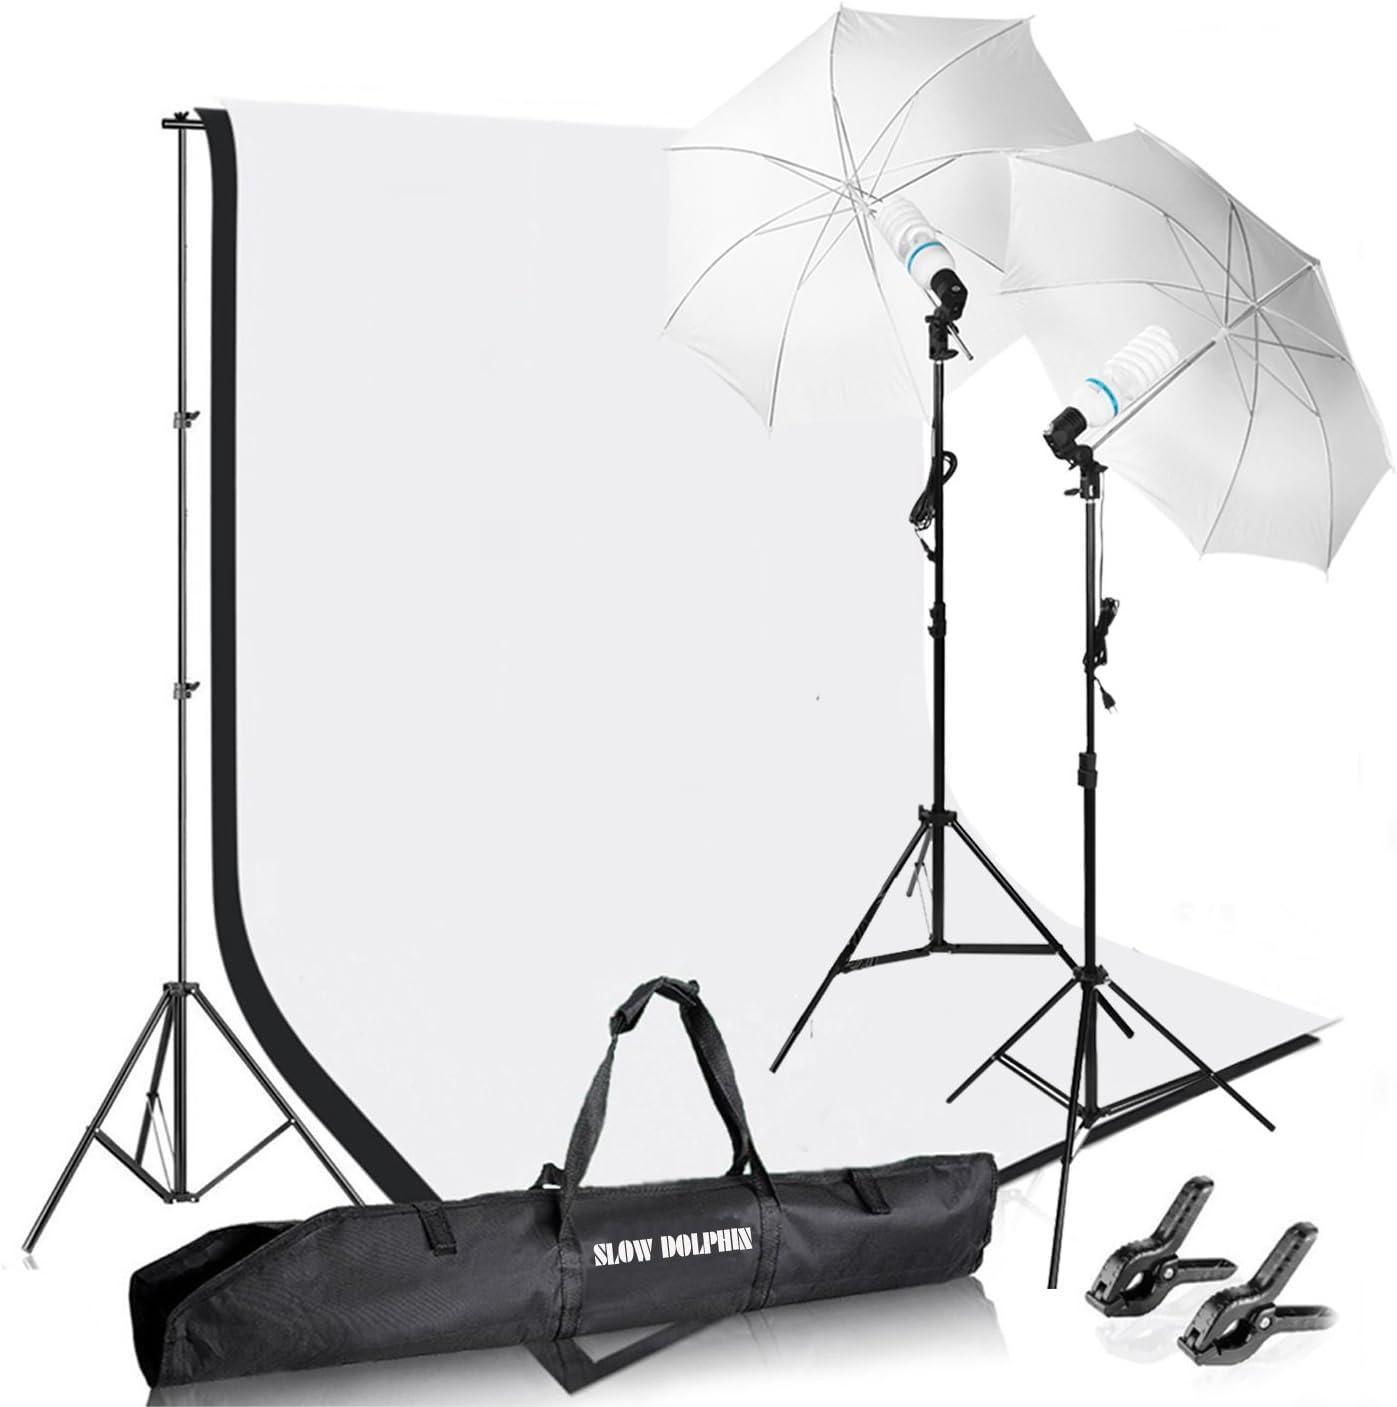 Slow Dolphin Photography Photo Video Studio Background Stand Support Kit with Muslin Backdrop Kits (White Black),1050W 5500K Daylight Umbrella Lighting Kit